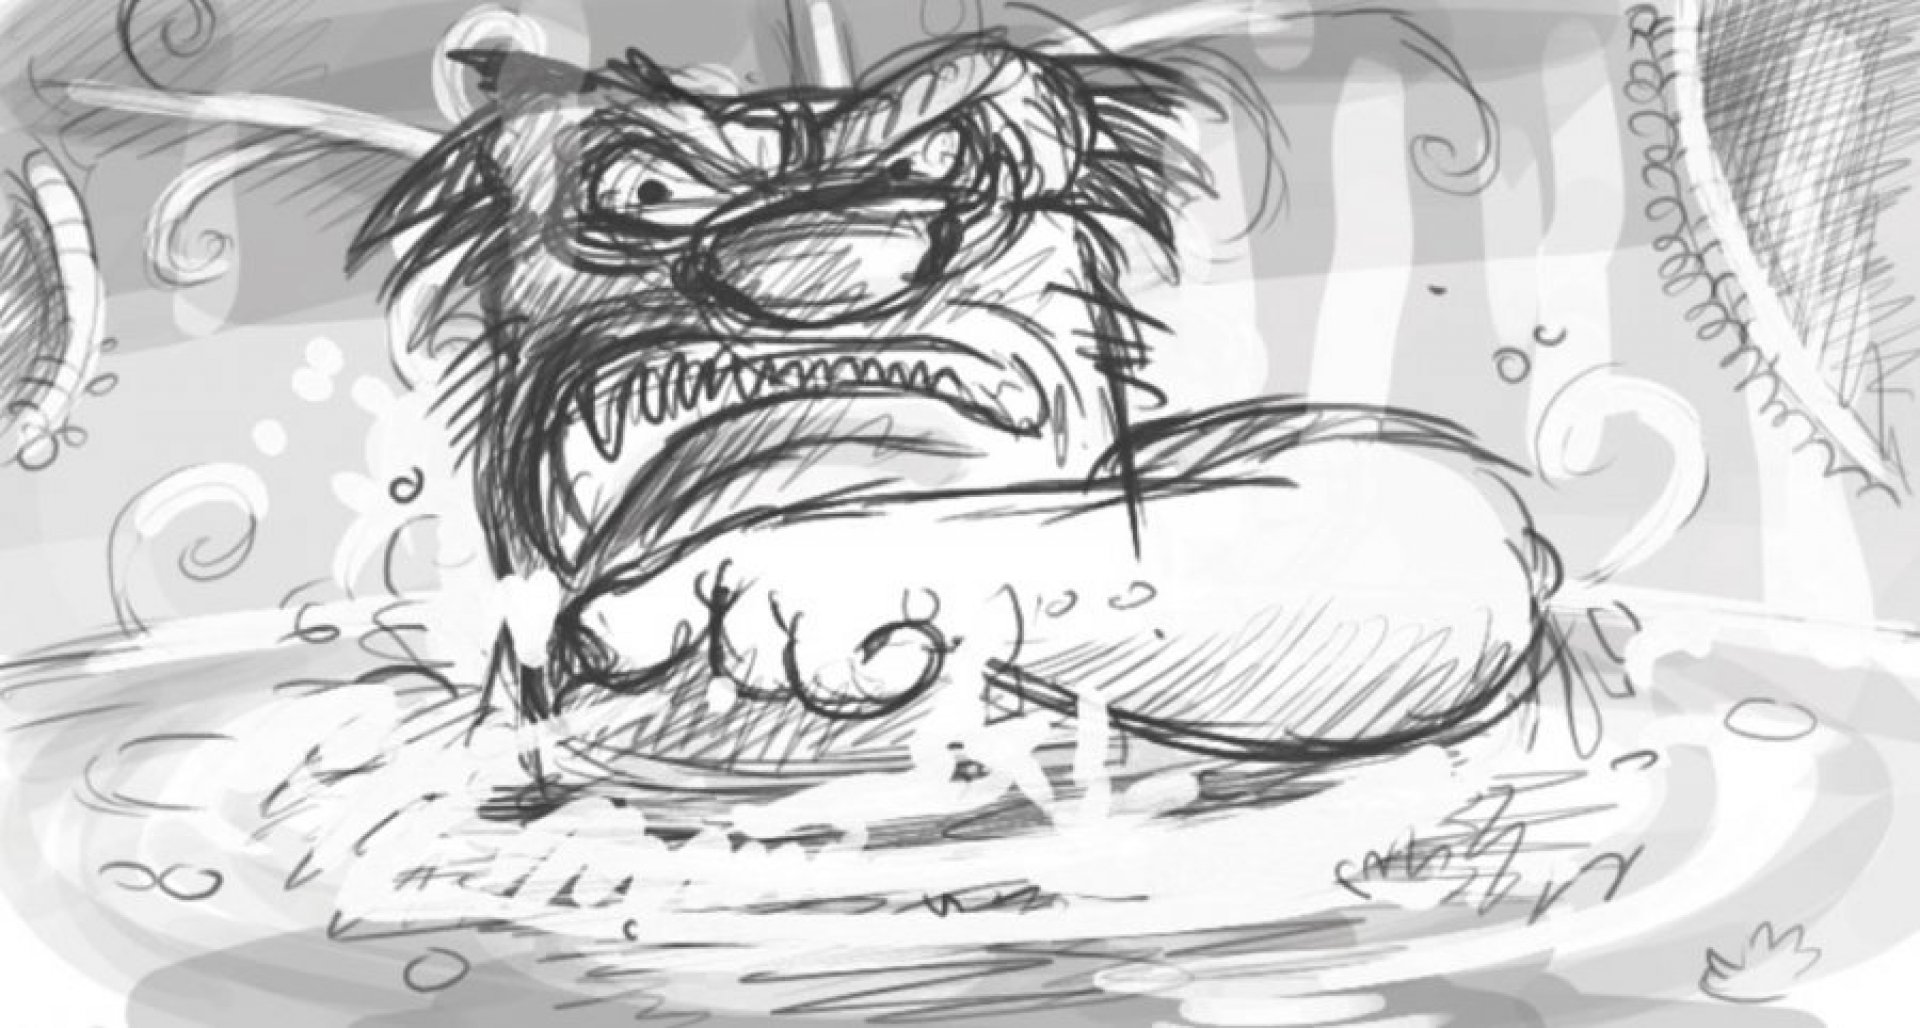 king in the bath